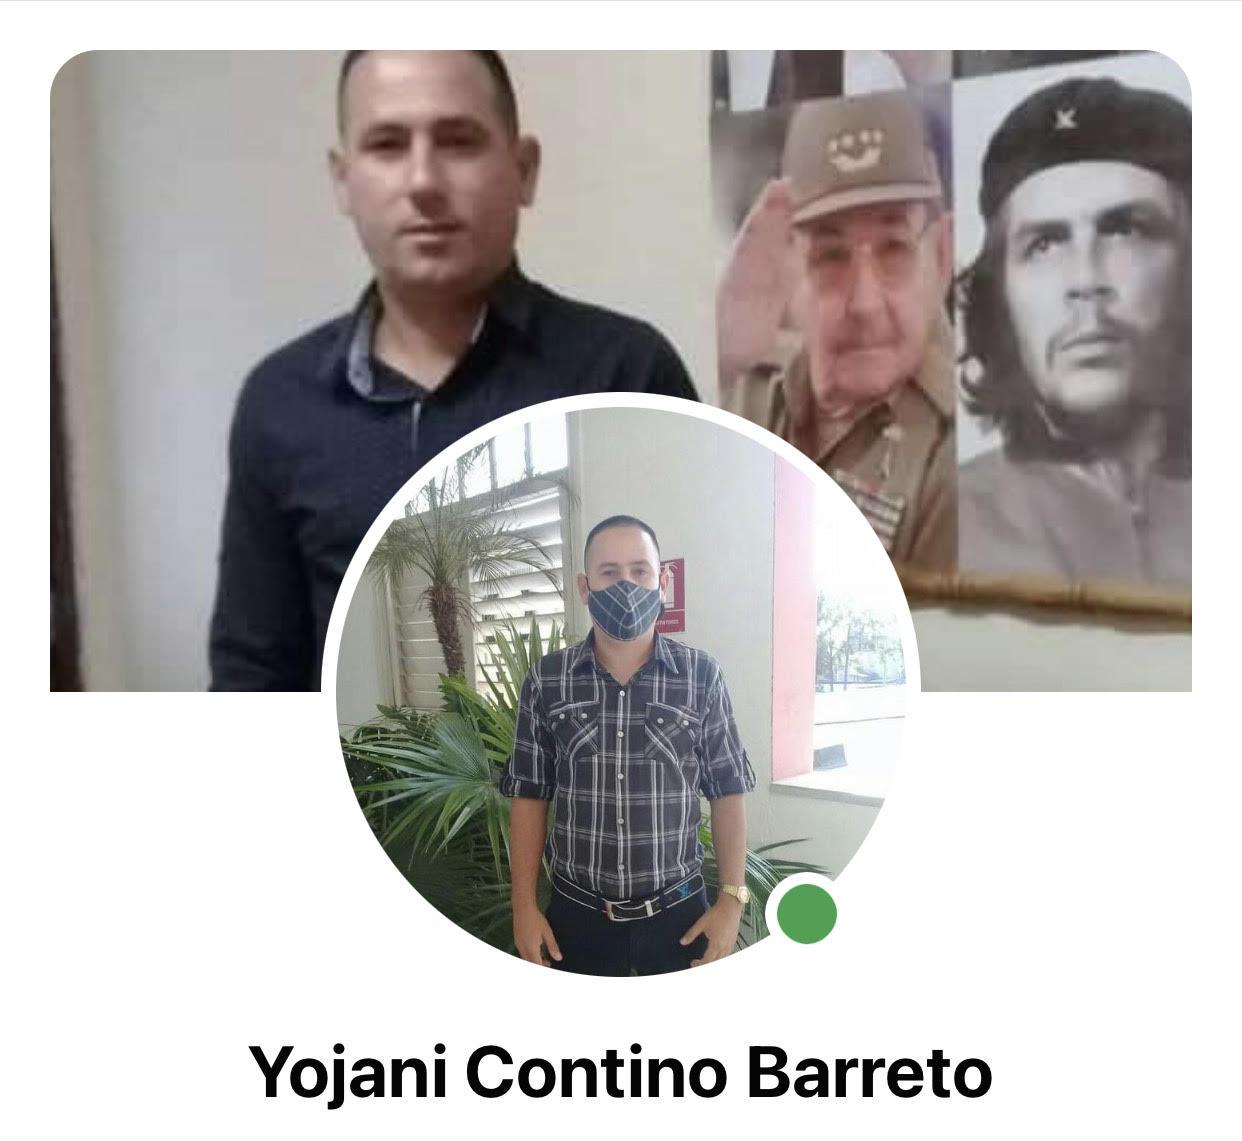 YOJANI CONTINO BARRETO